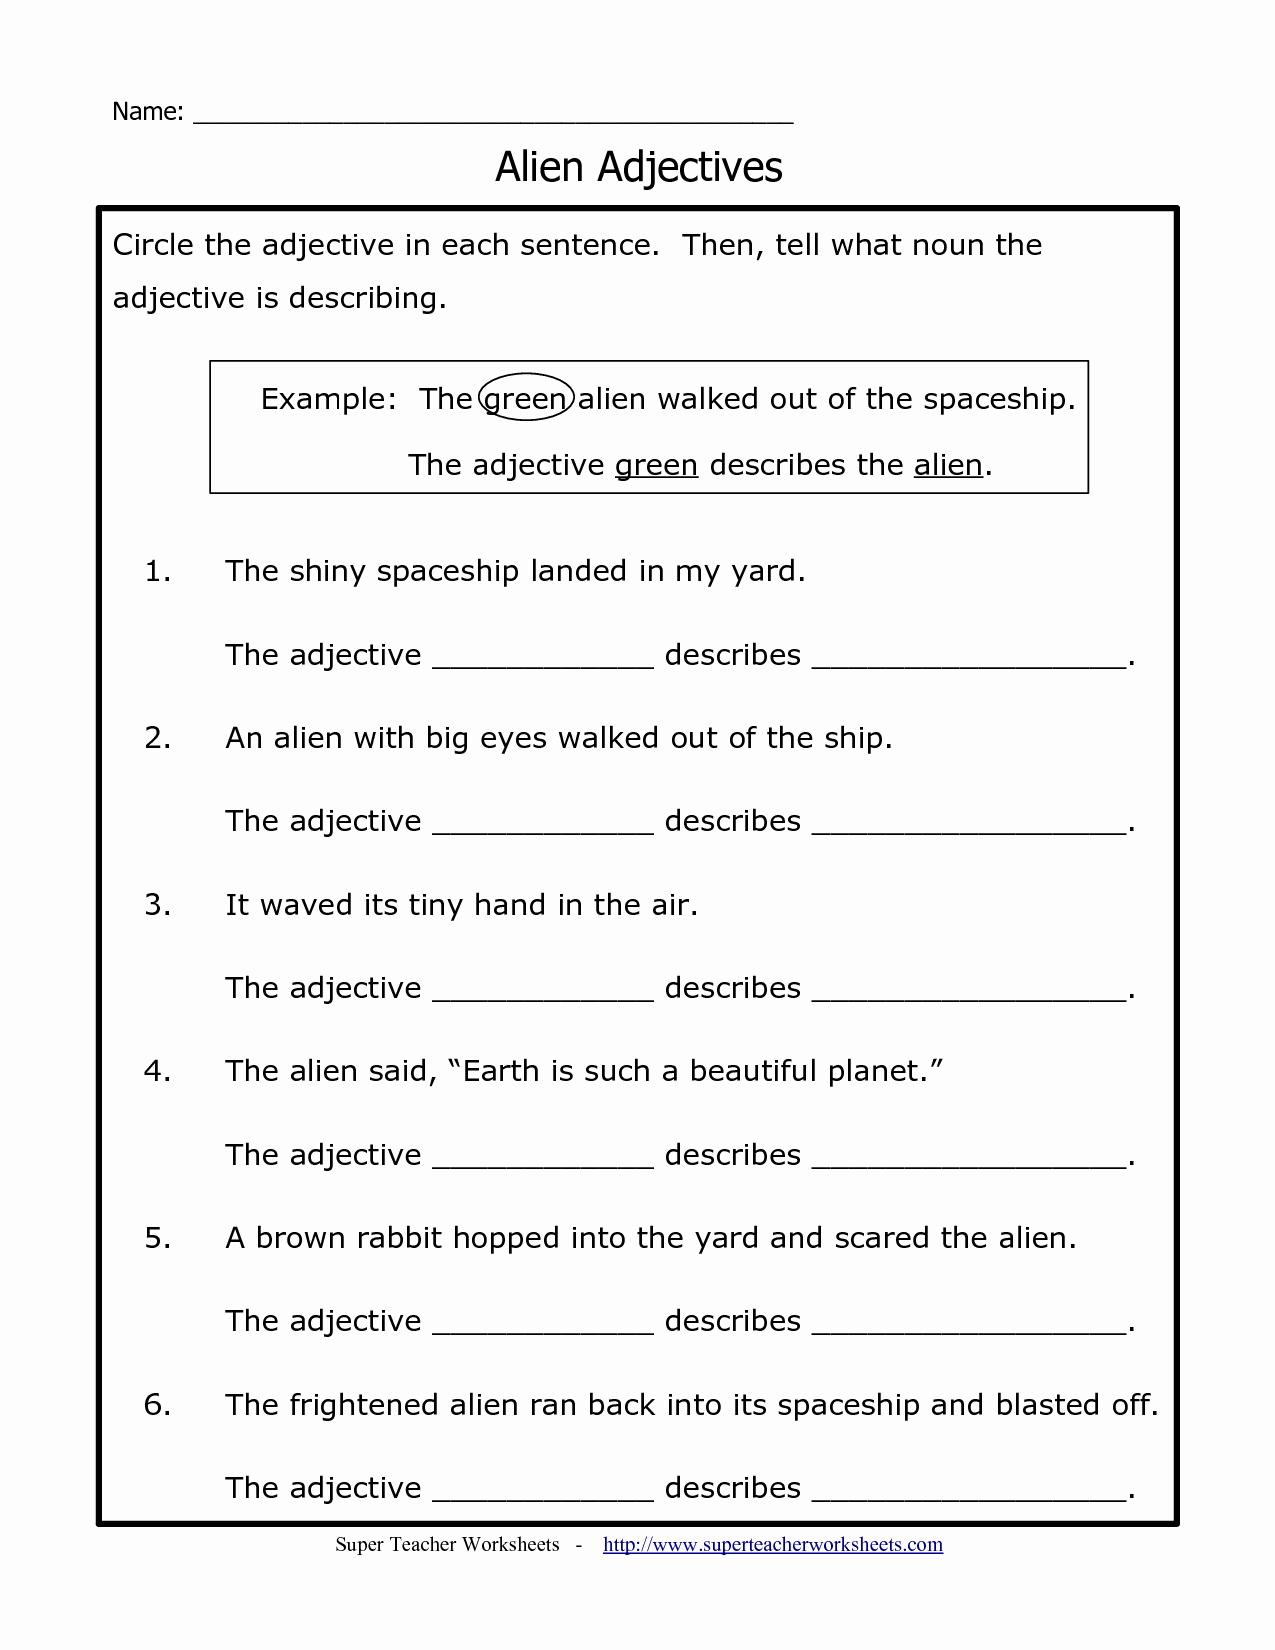 Free Printable Adjective Worksheets Elegant Printable Adjective Worksheet for 2nd Grade